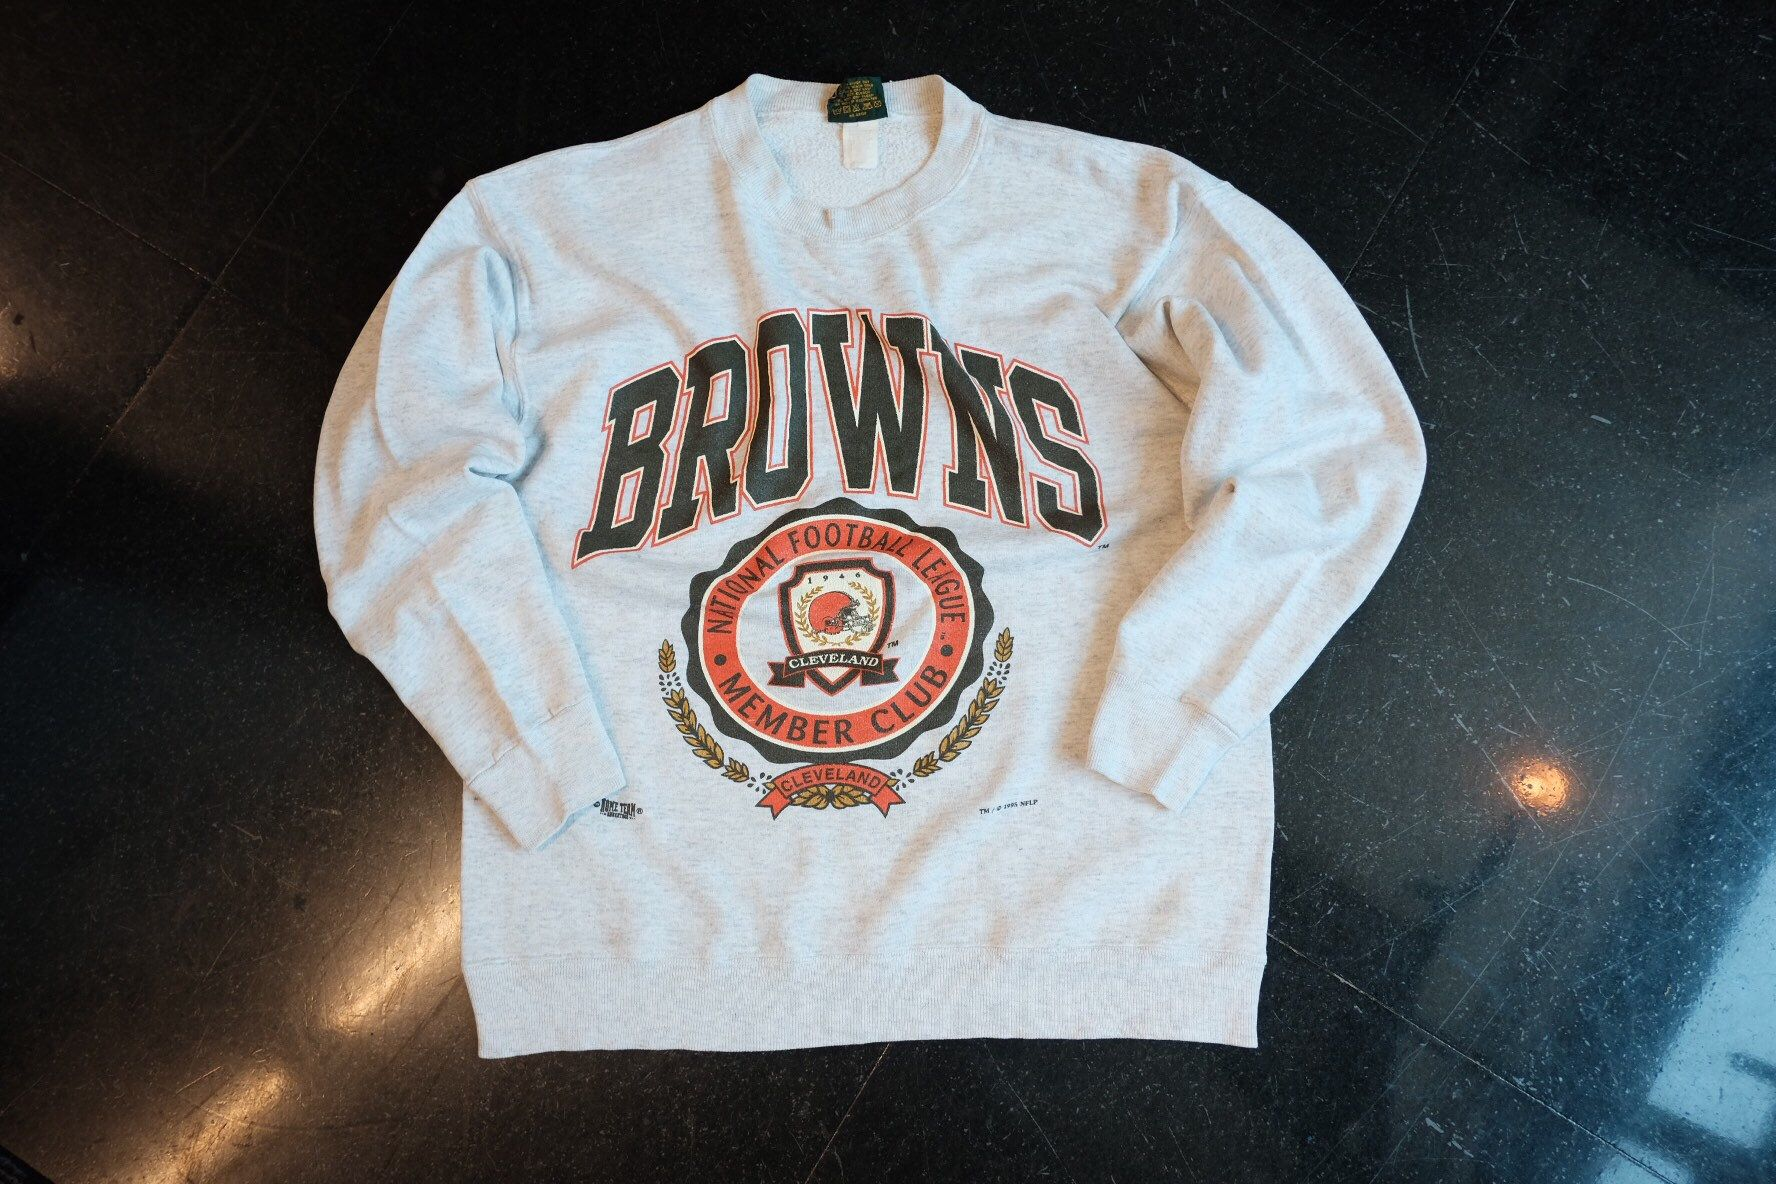 1995 Cleveland Browns Sweatshirt Nfl Football 90s Sweatshirt Etsy Cleveland Browns Sweatshirt Brown Sweatshirt 90s Sweatshirt [ 1184 x 1776 Pixel ]